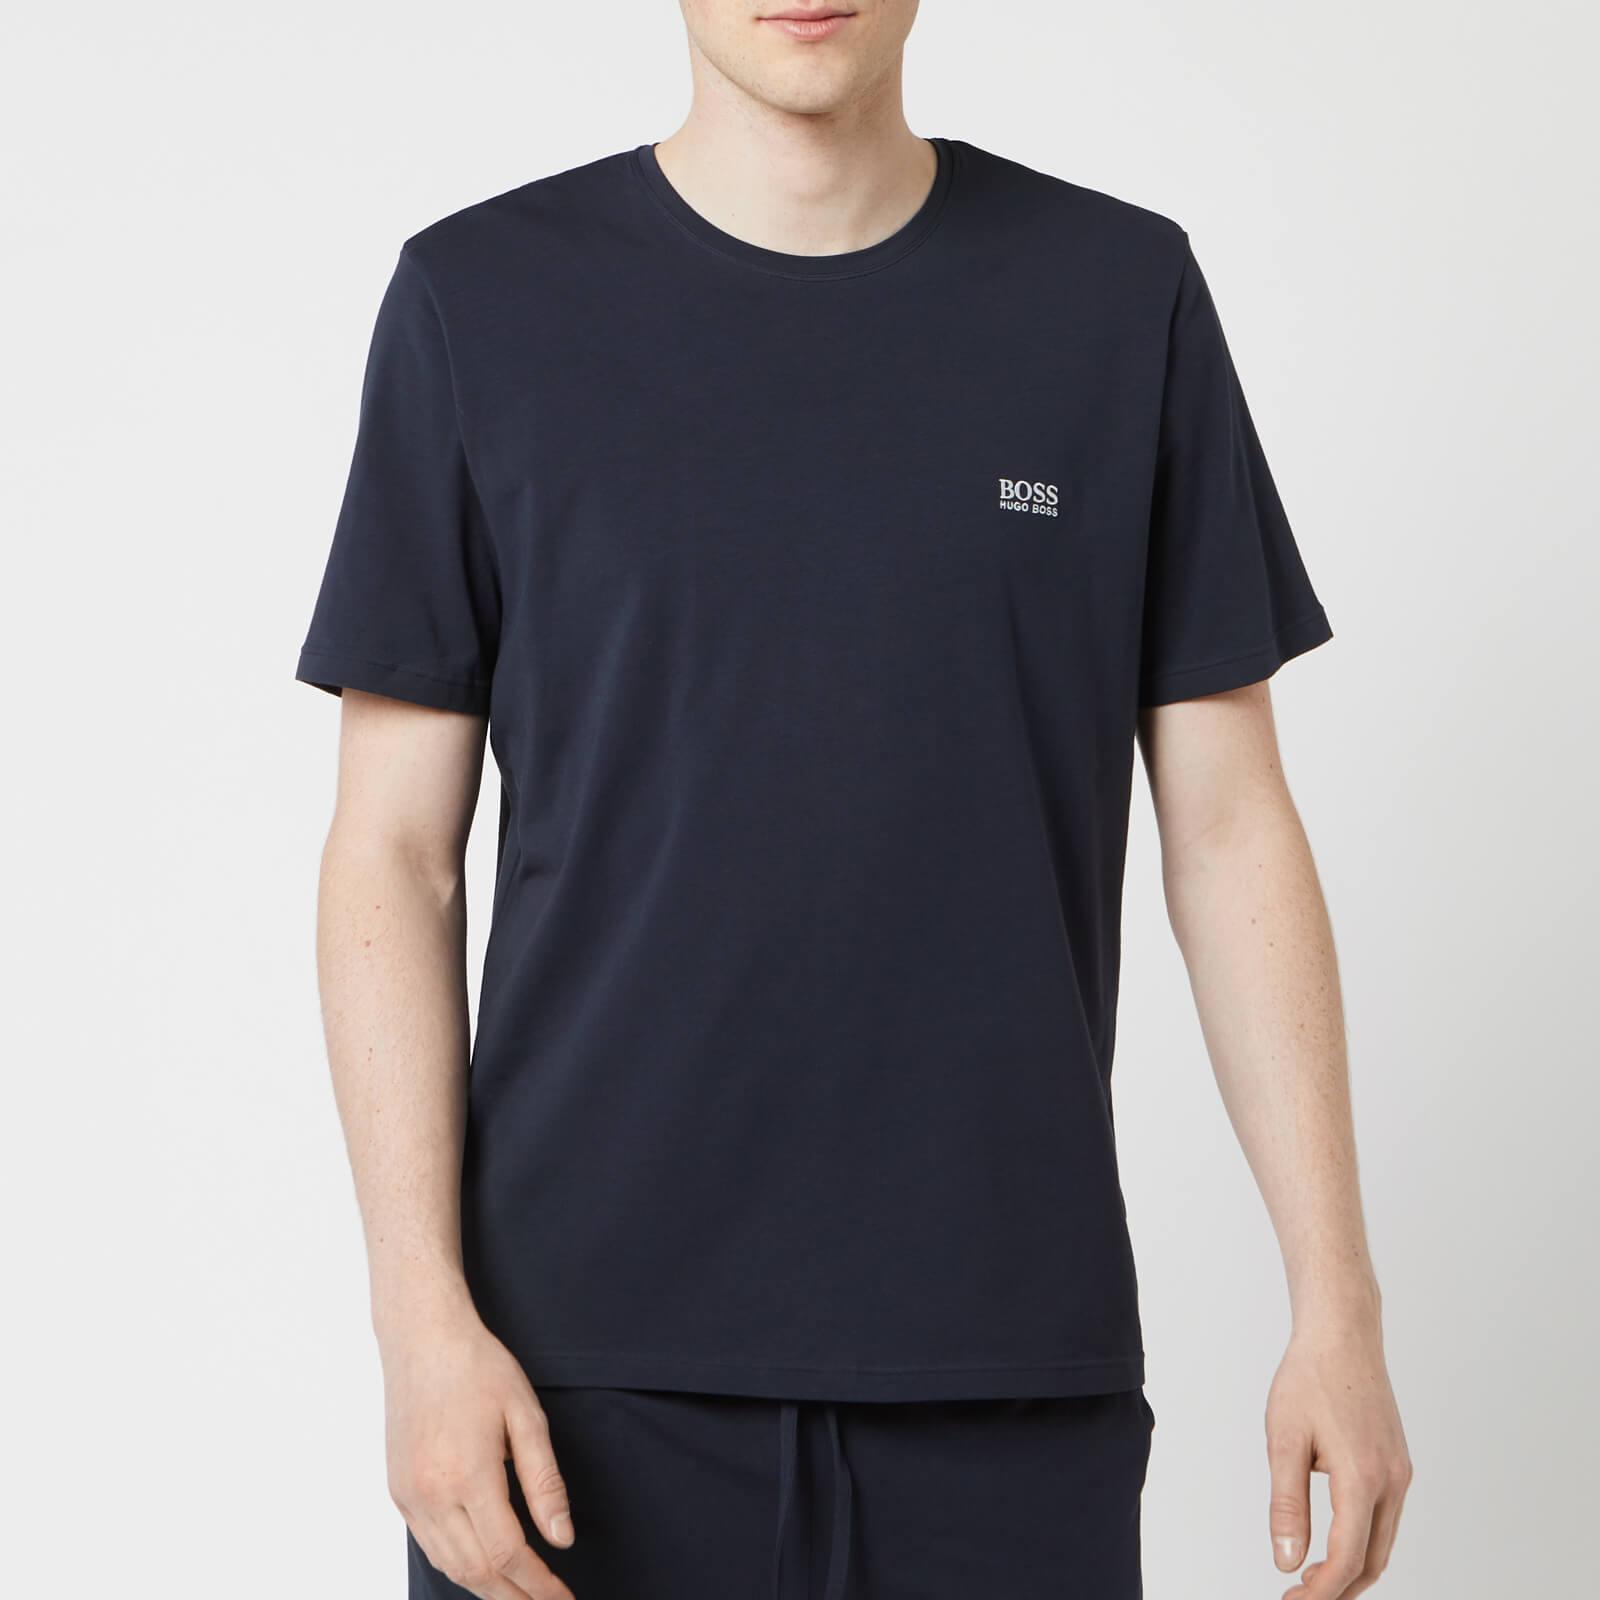 crazy price discount for sale Super discount BOSS Hugo Boss Men's Crew Neck Small Logo T-Shirt - Navy